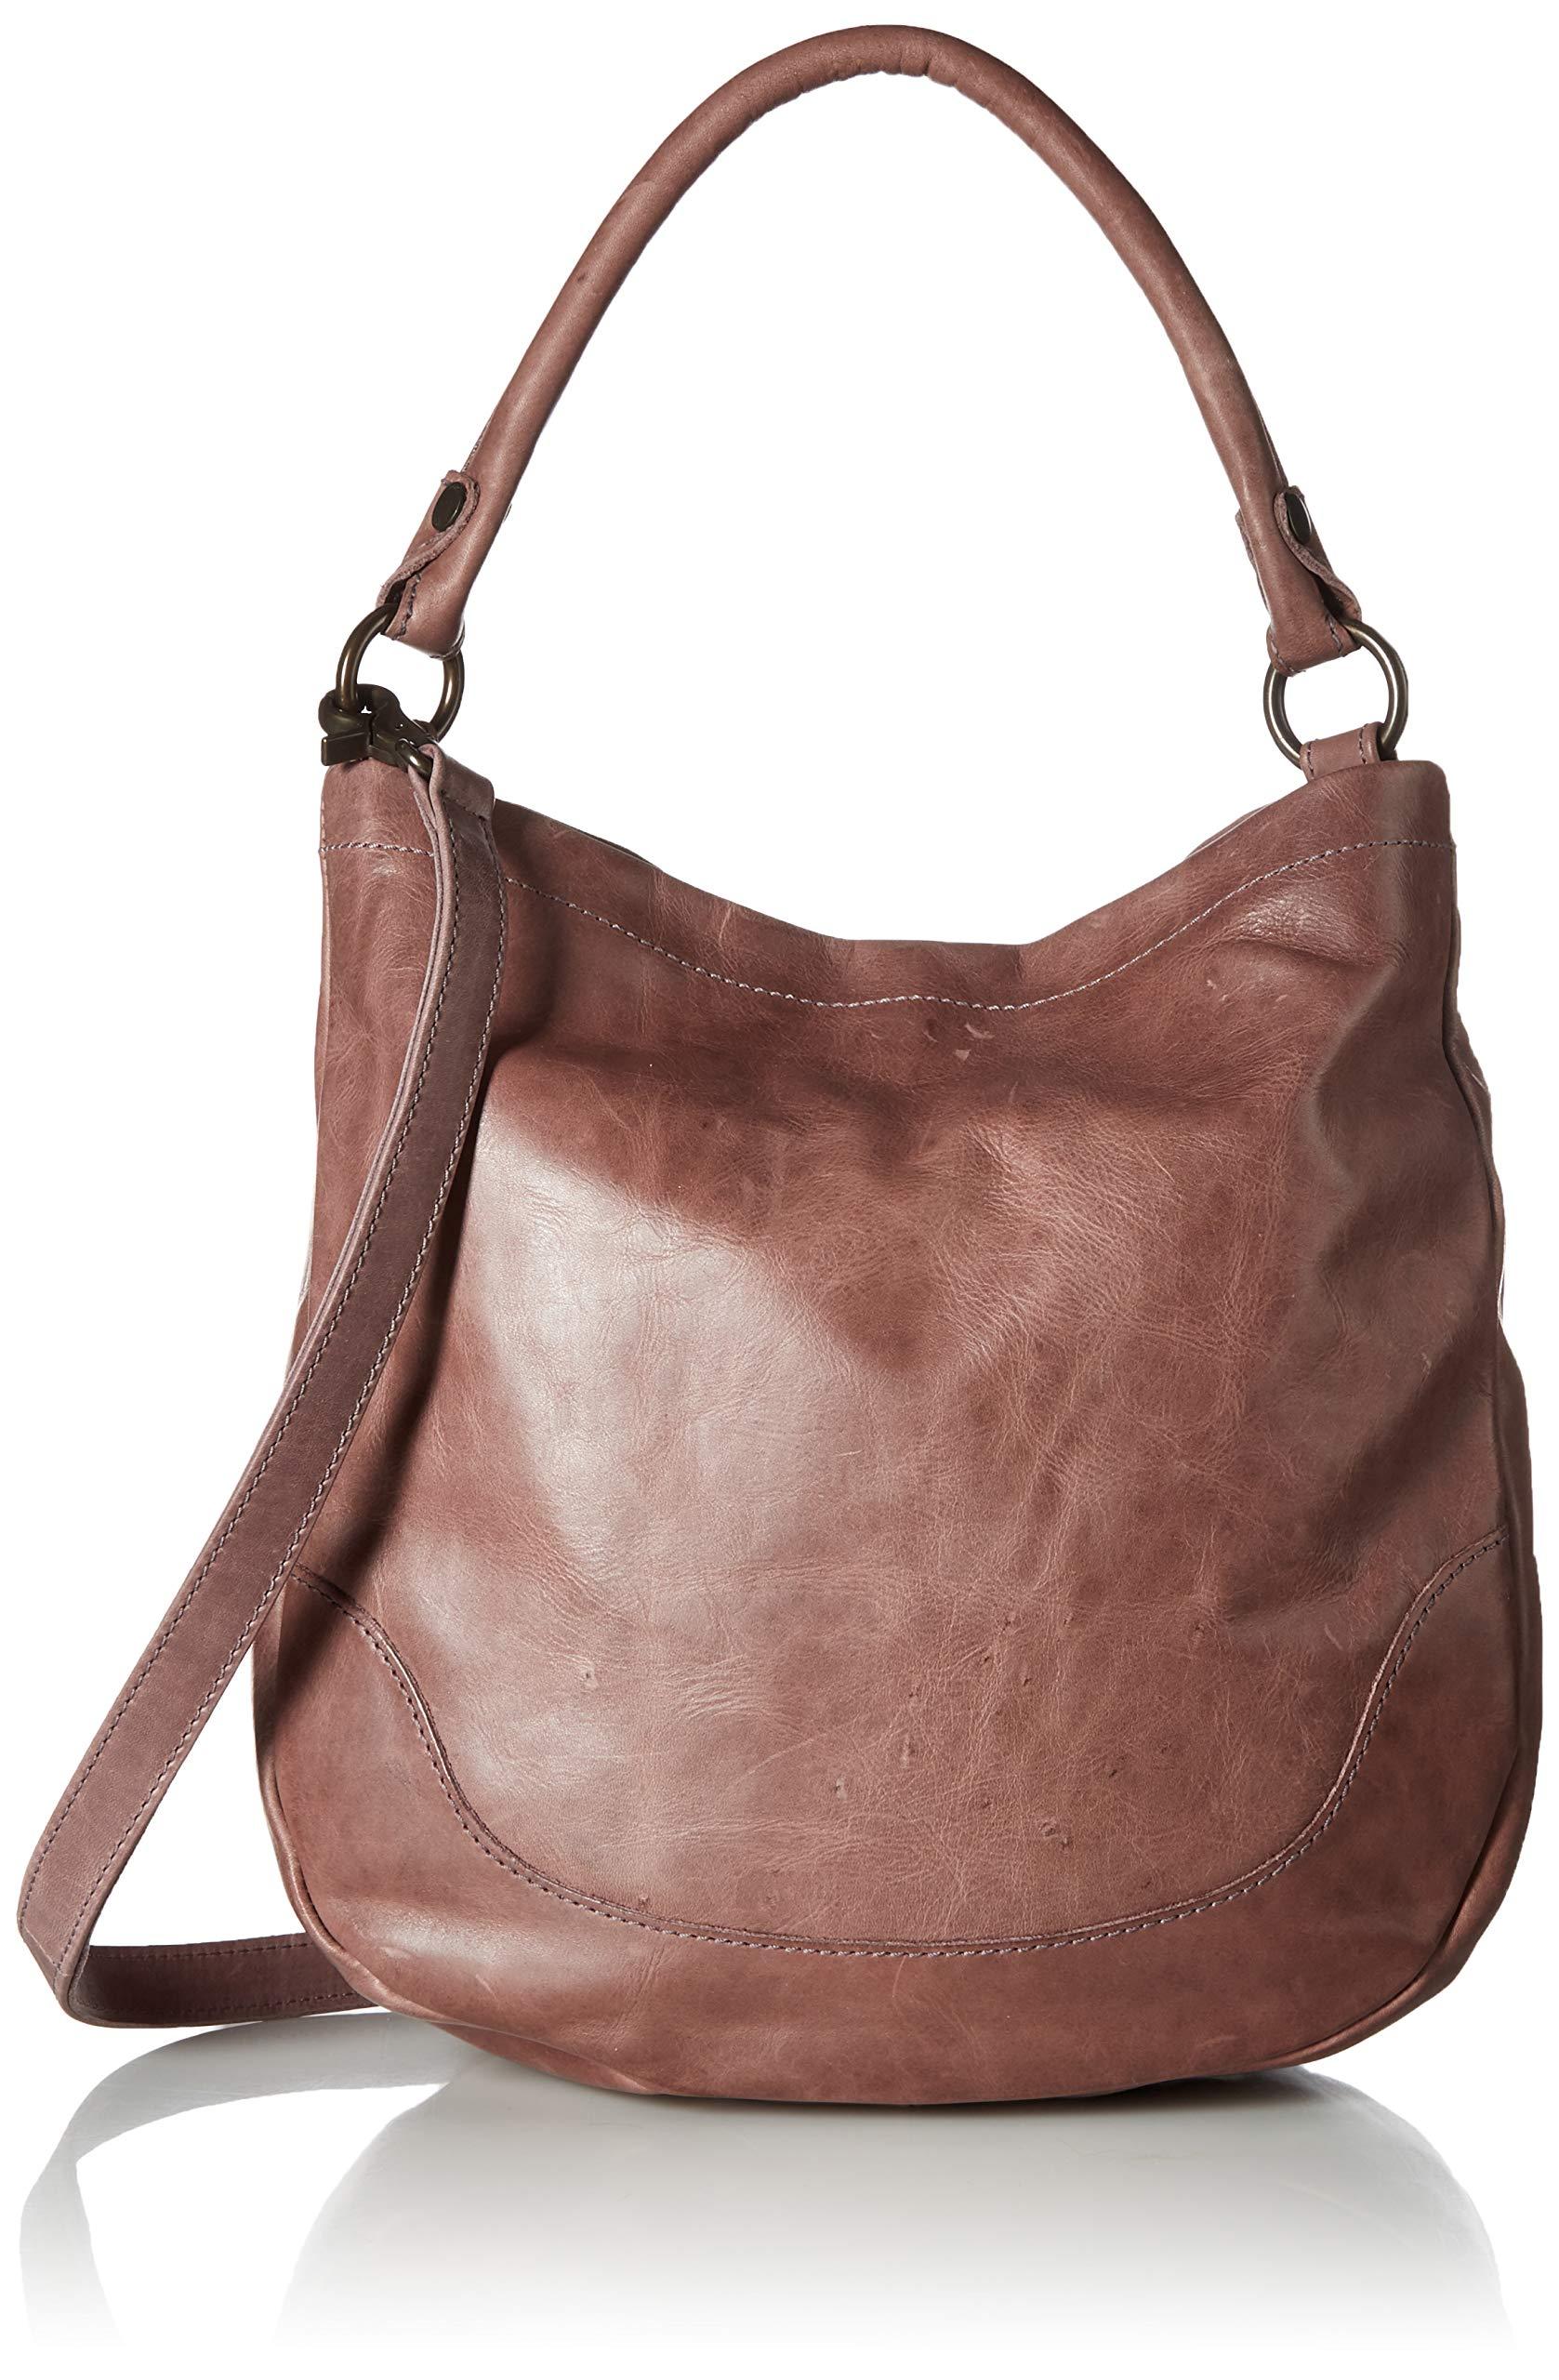 FRYE Melissa Hobo Leather Handbag, lilac